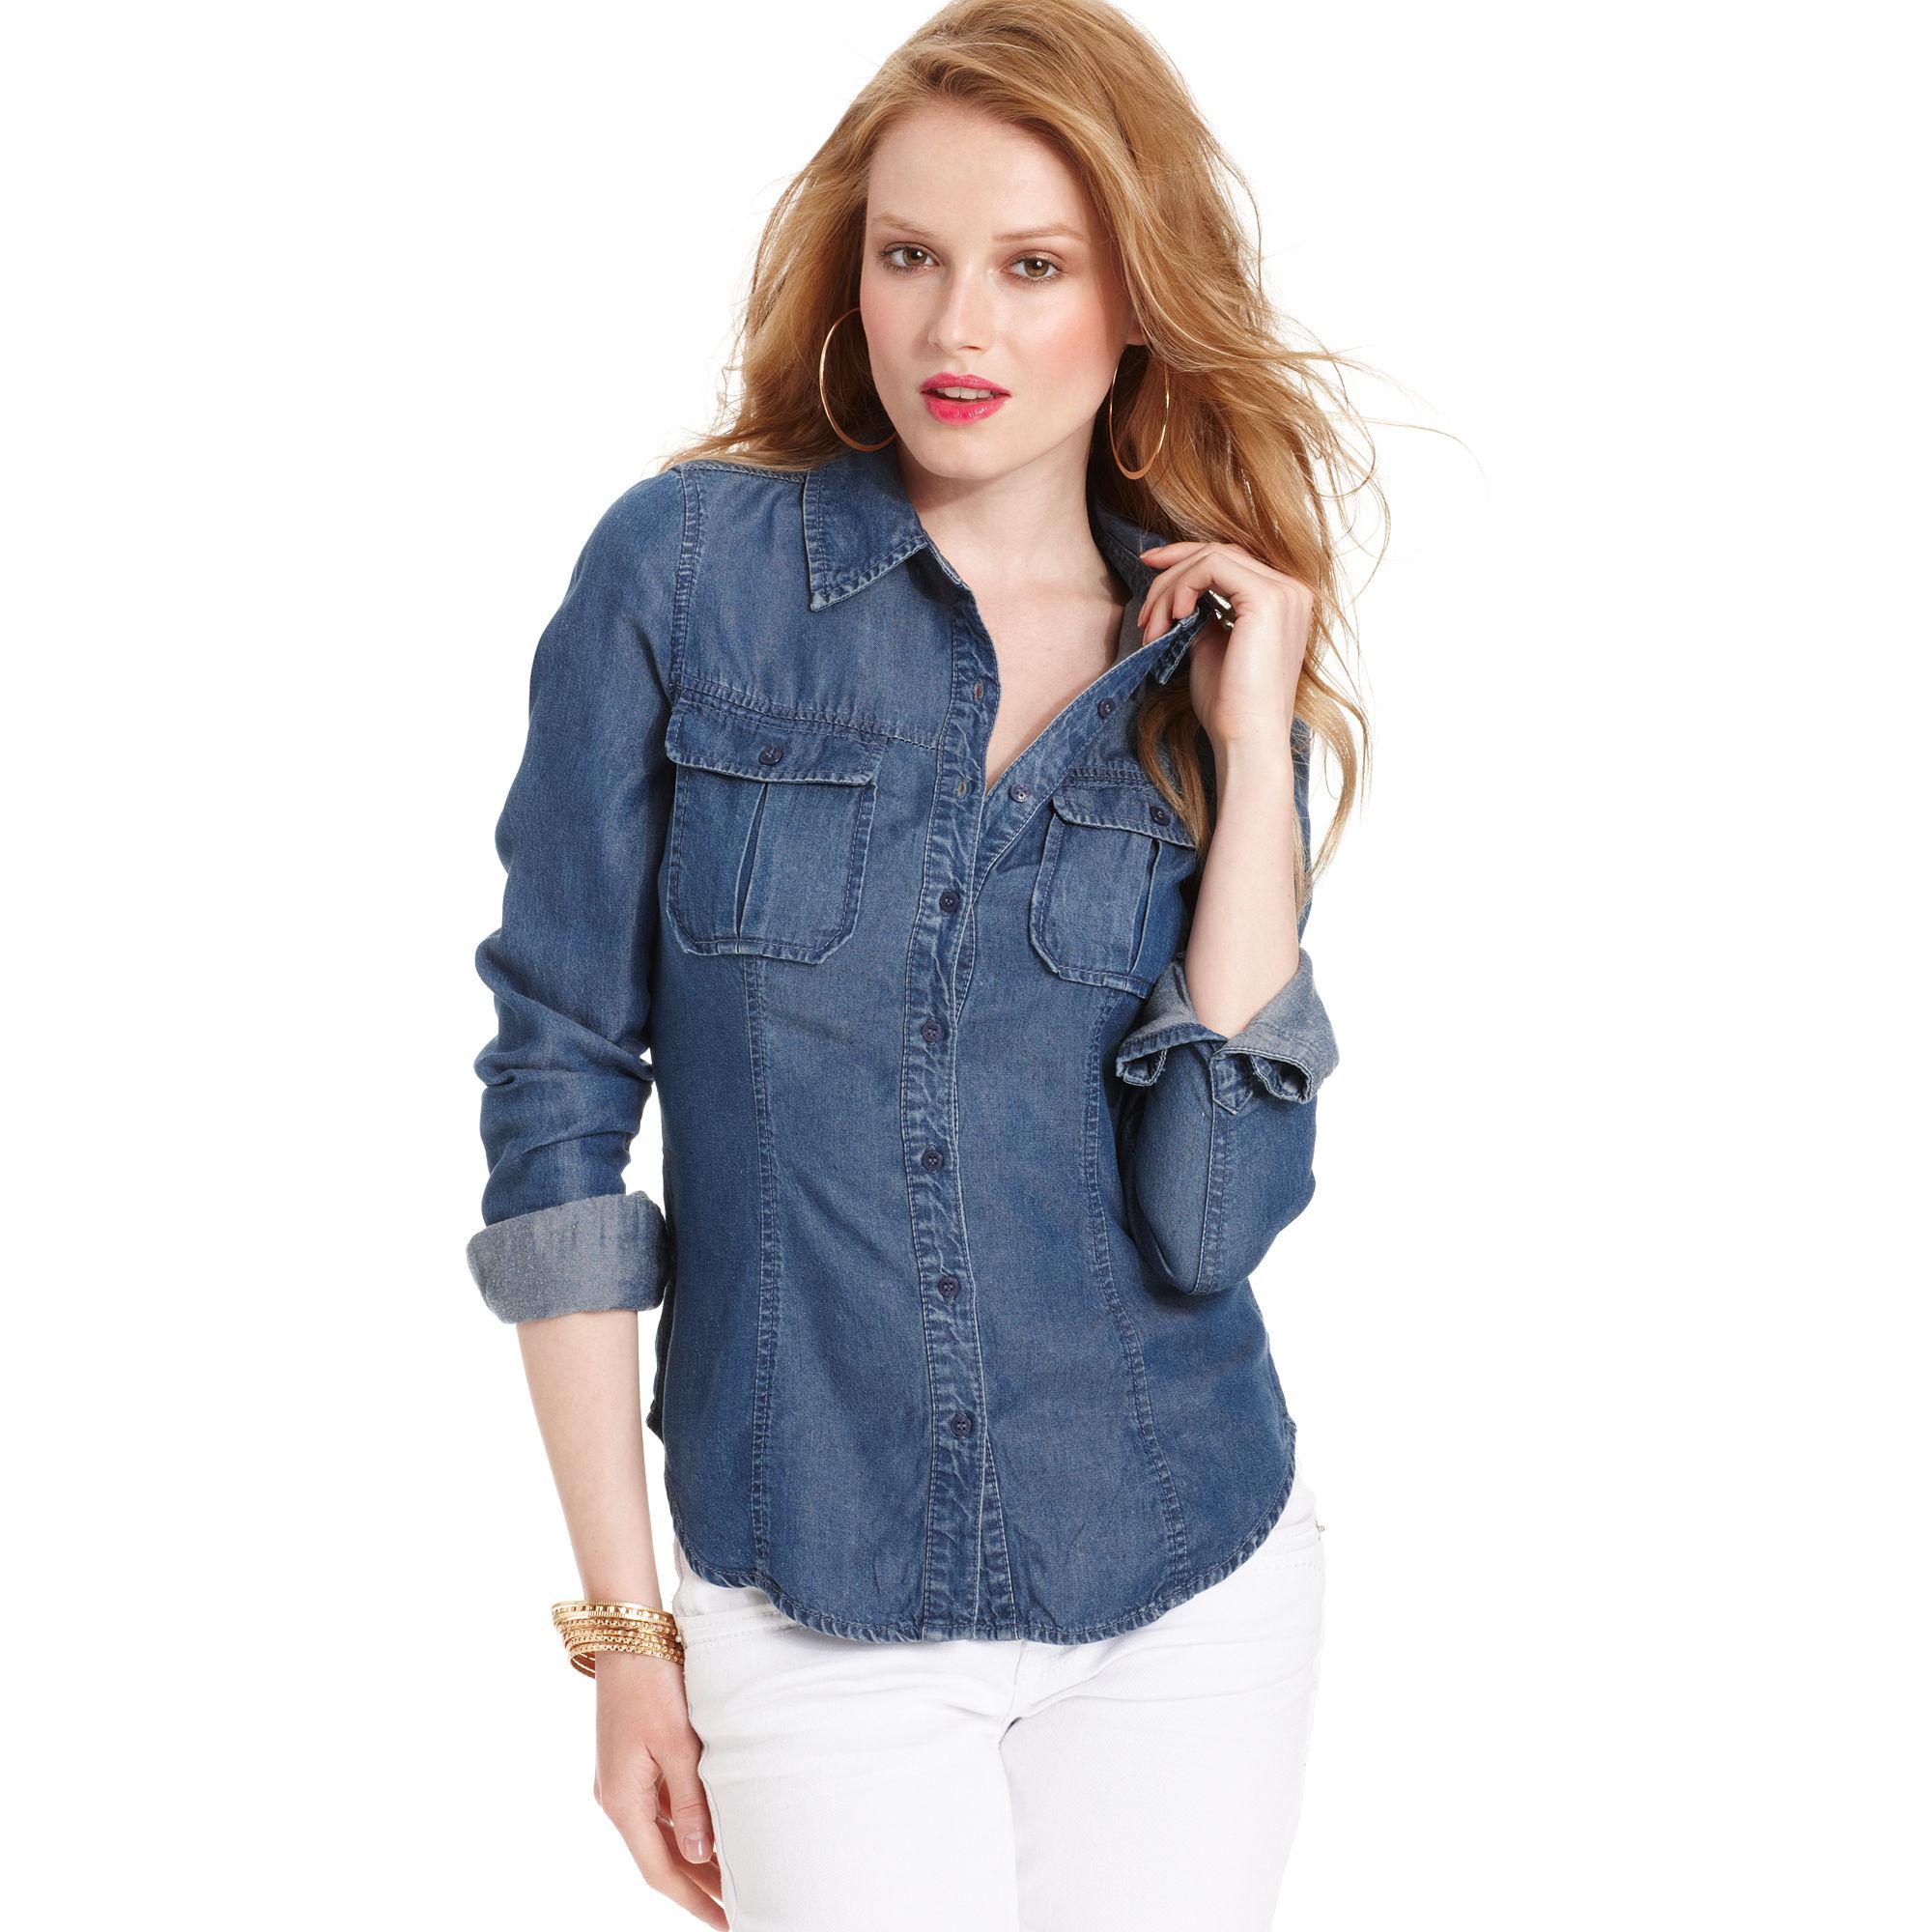 Guess Top Longsleeve Denim Shirt In Blue Lyst